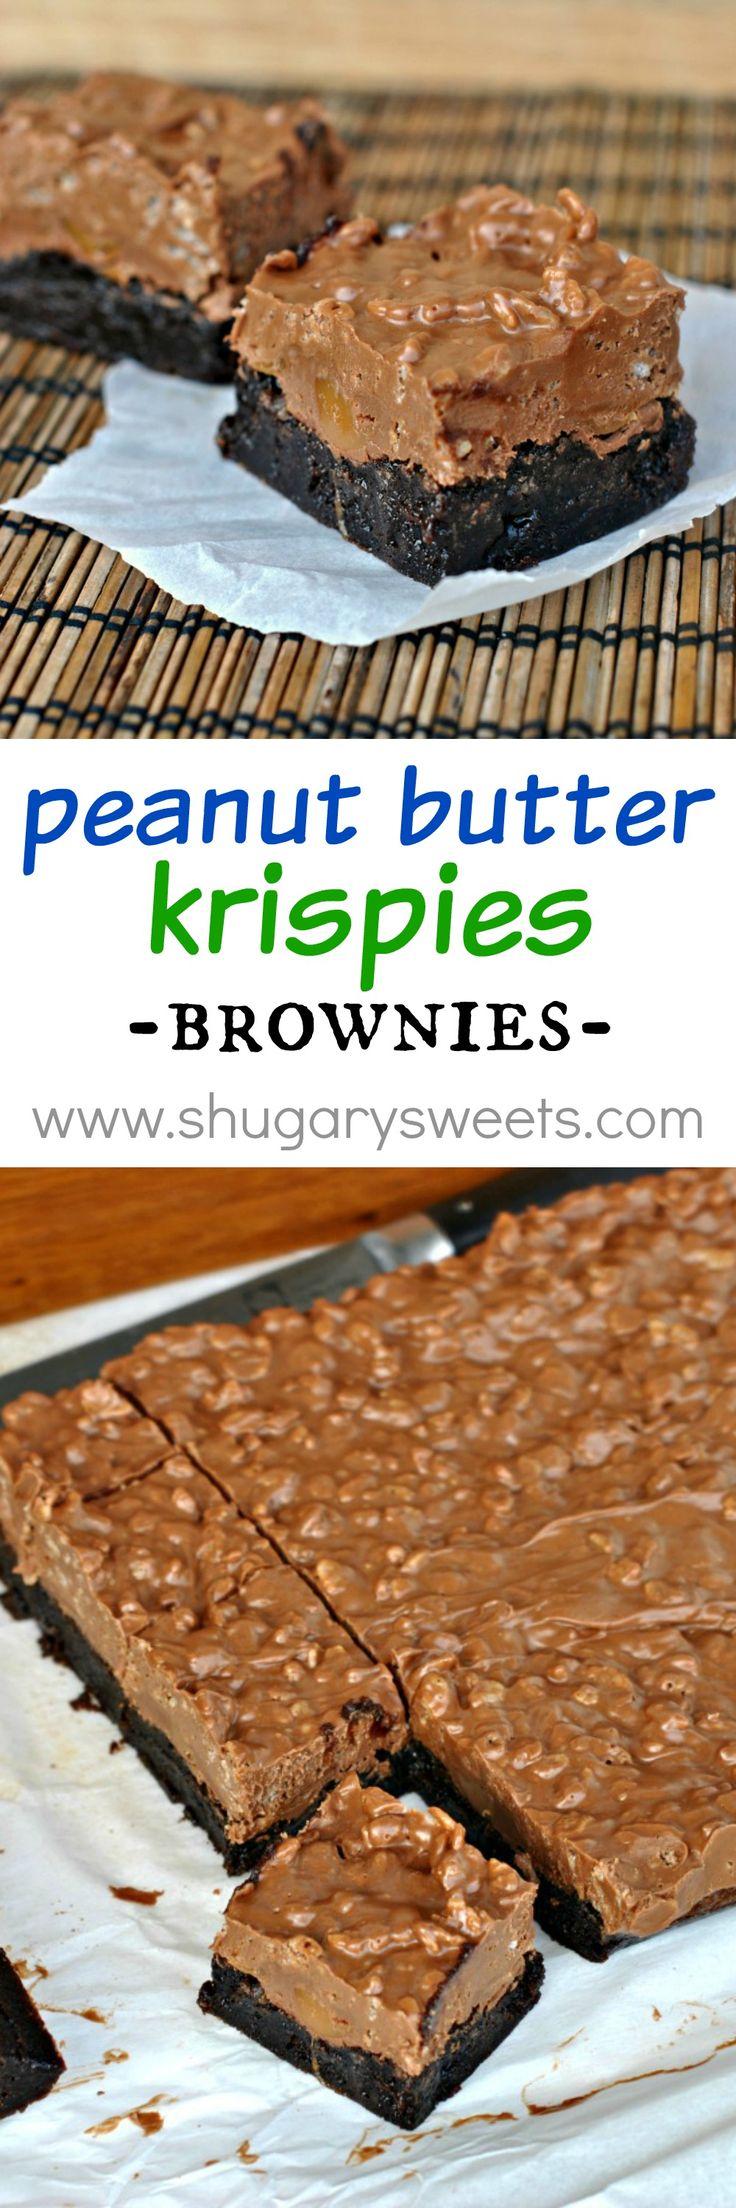 Peanut Butter Krispies Layered Brownie